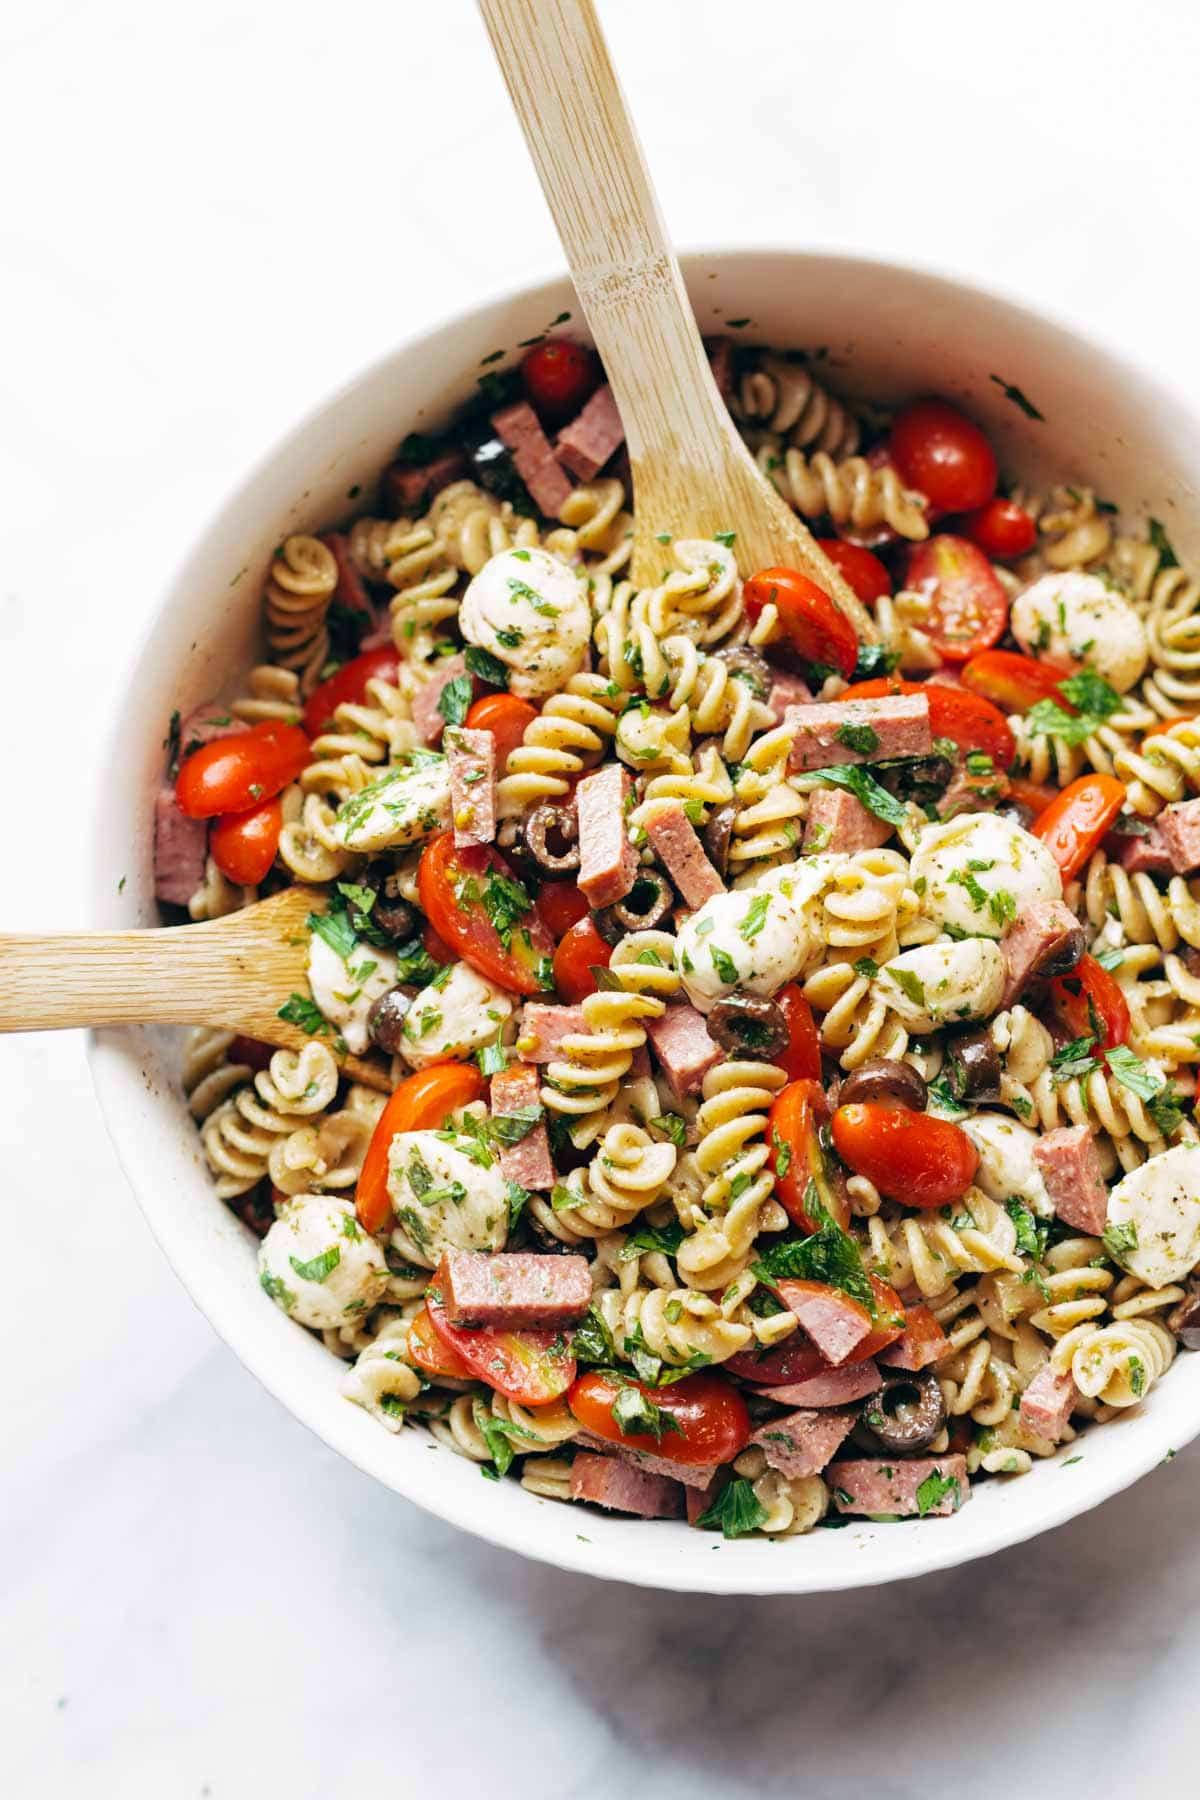 Easy Italian Pasta Salads  Best Easy Italian Pasta Salad Recipe Pinch of Yum